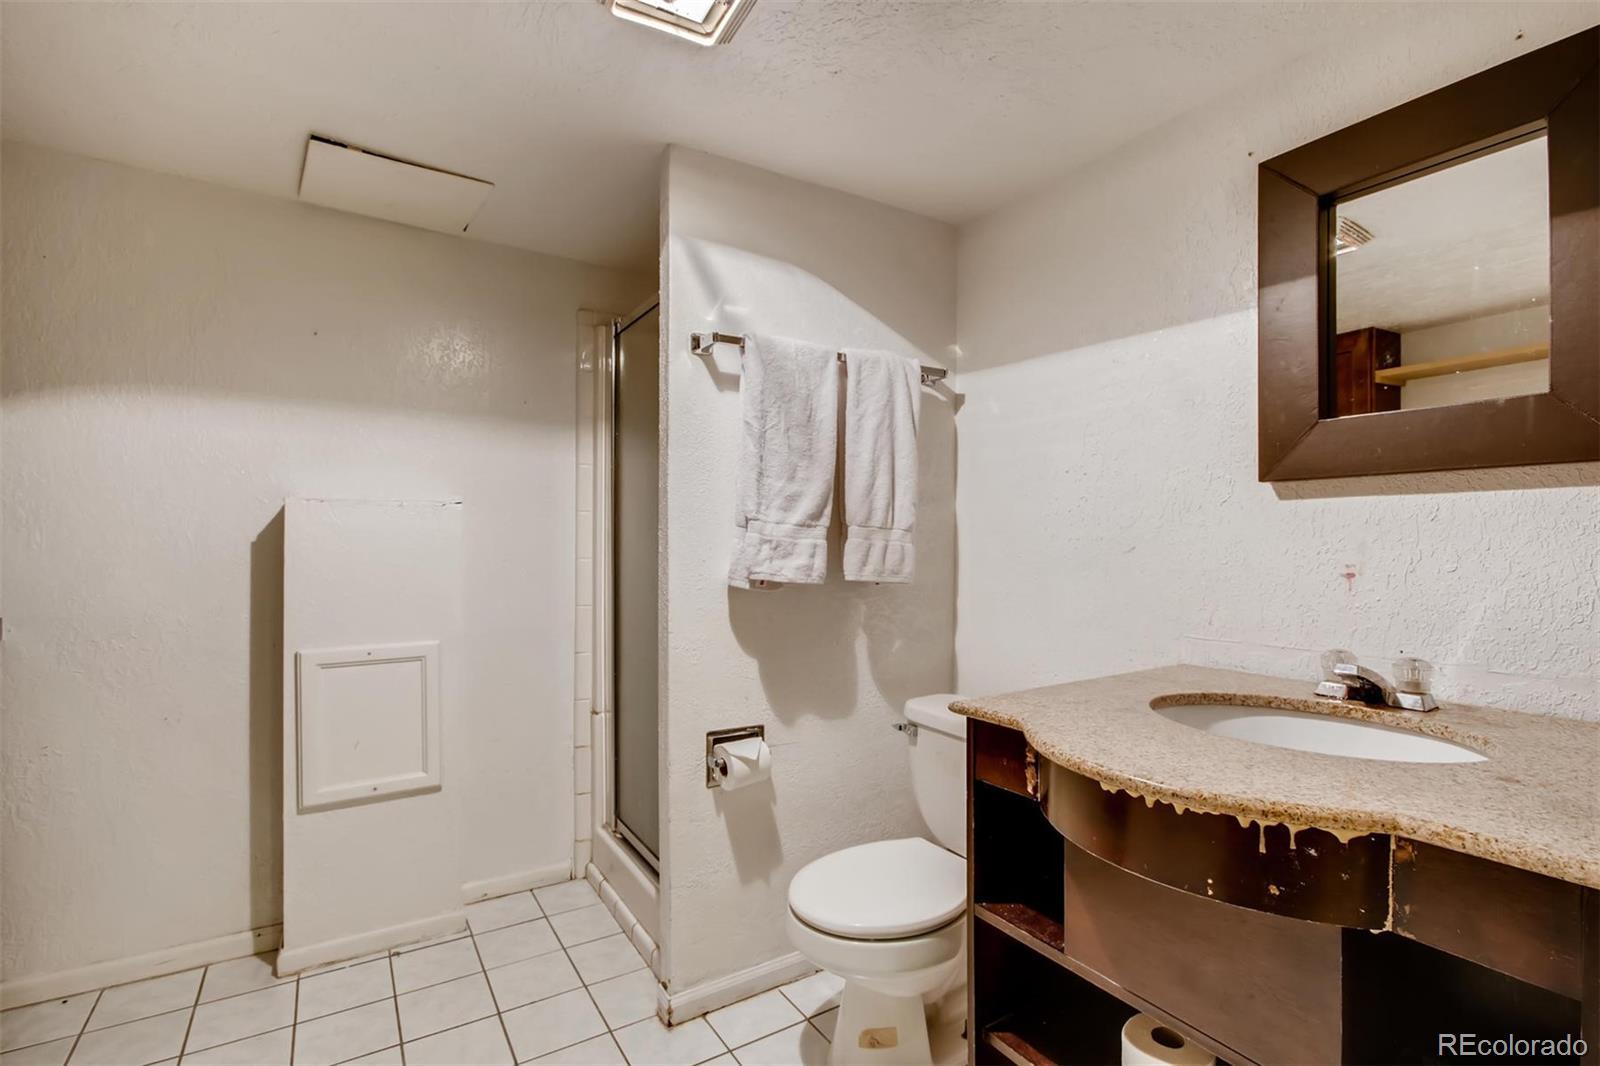 MLS# 1787929 - 27 - 20961 E 45th Avenue, Denver, CO 80249